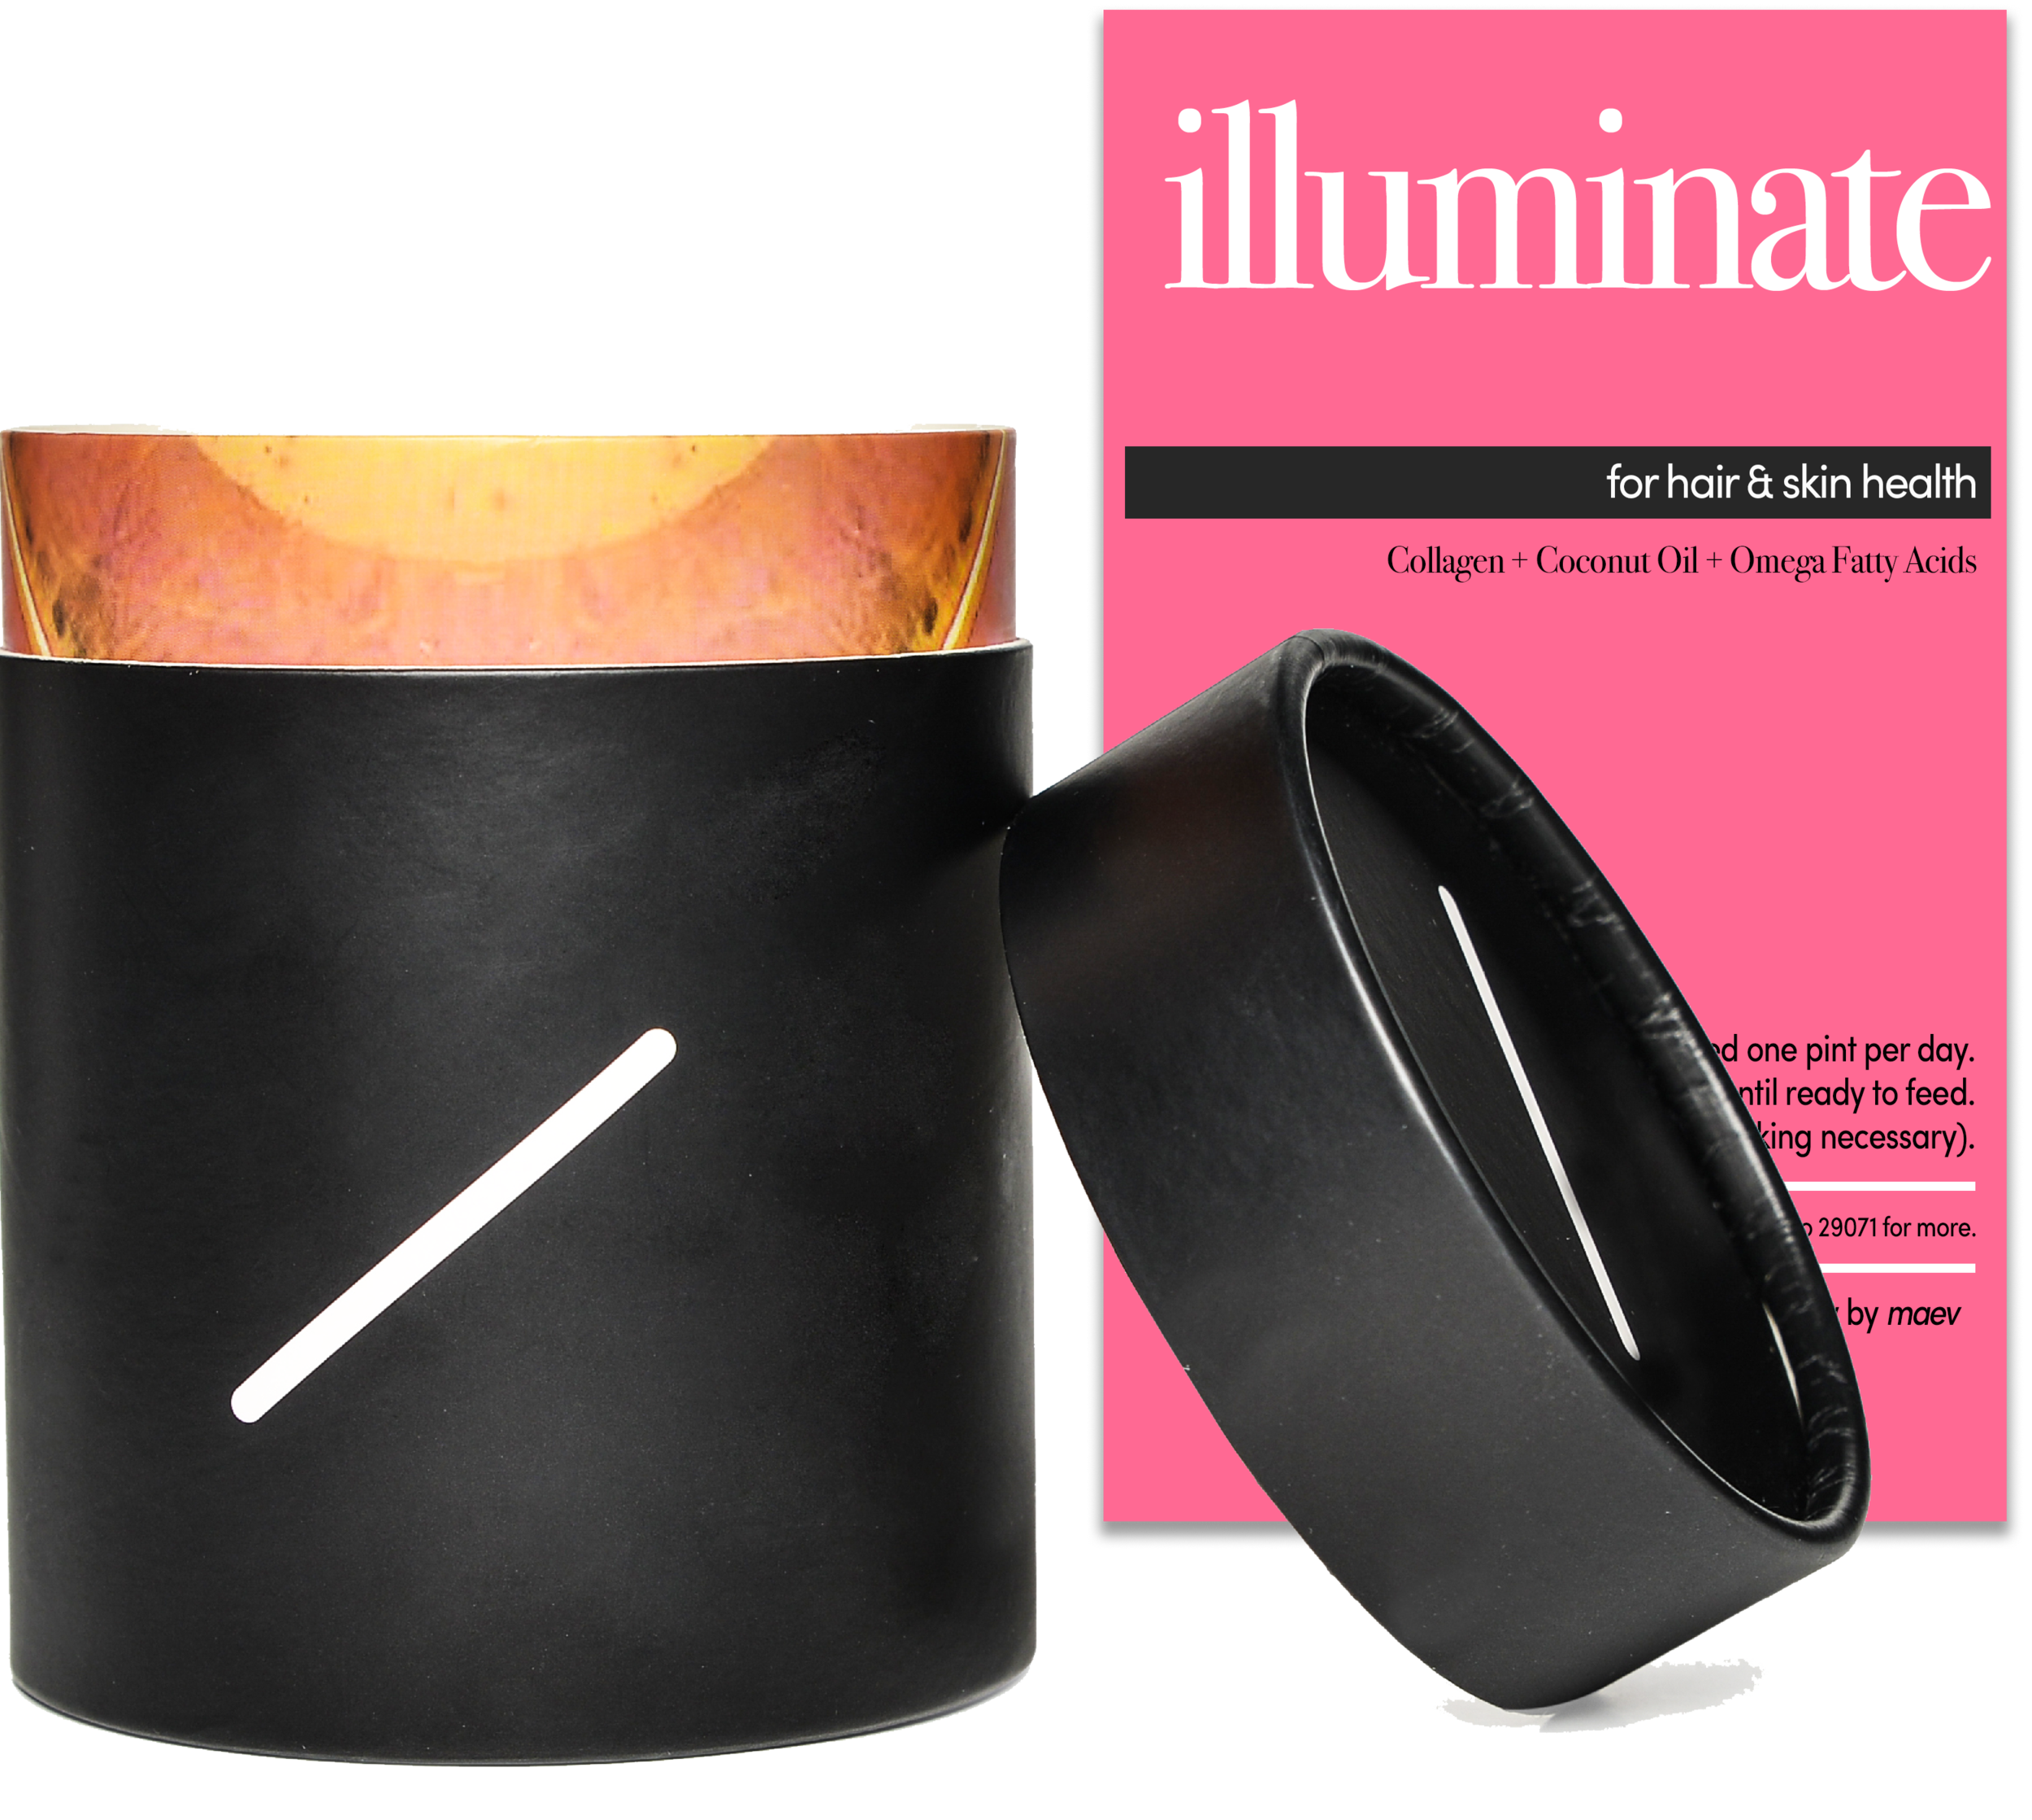 Illuminate: for Hair & Skin